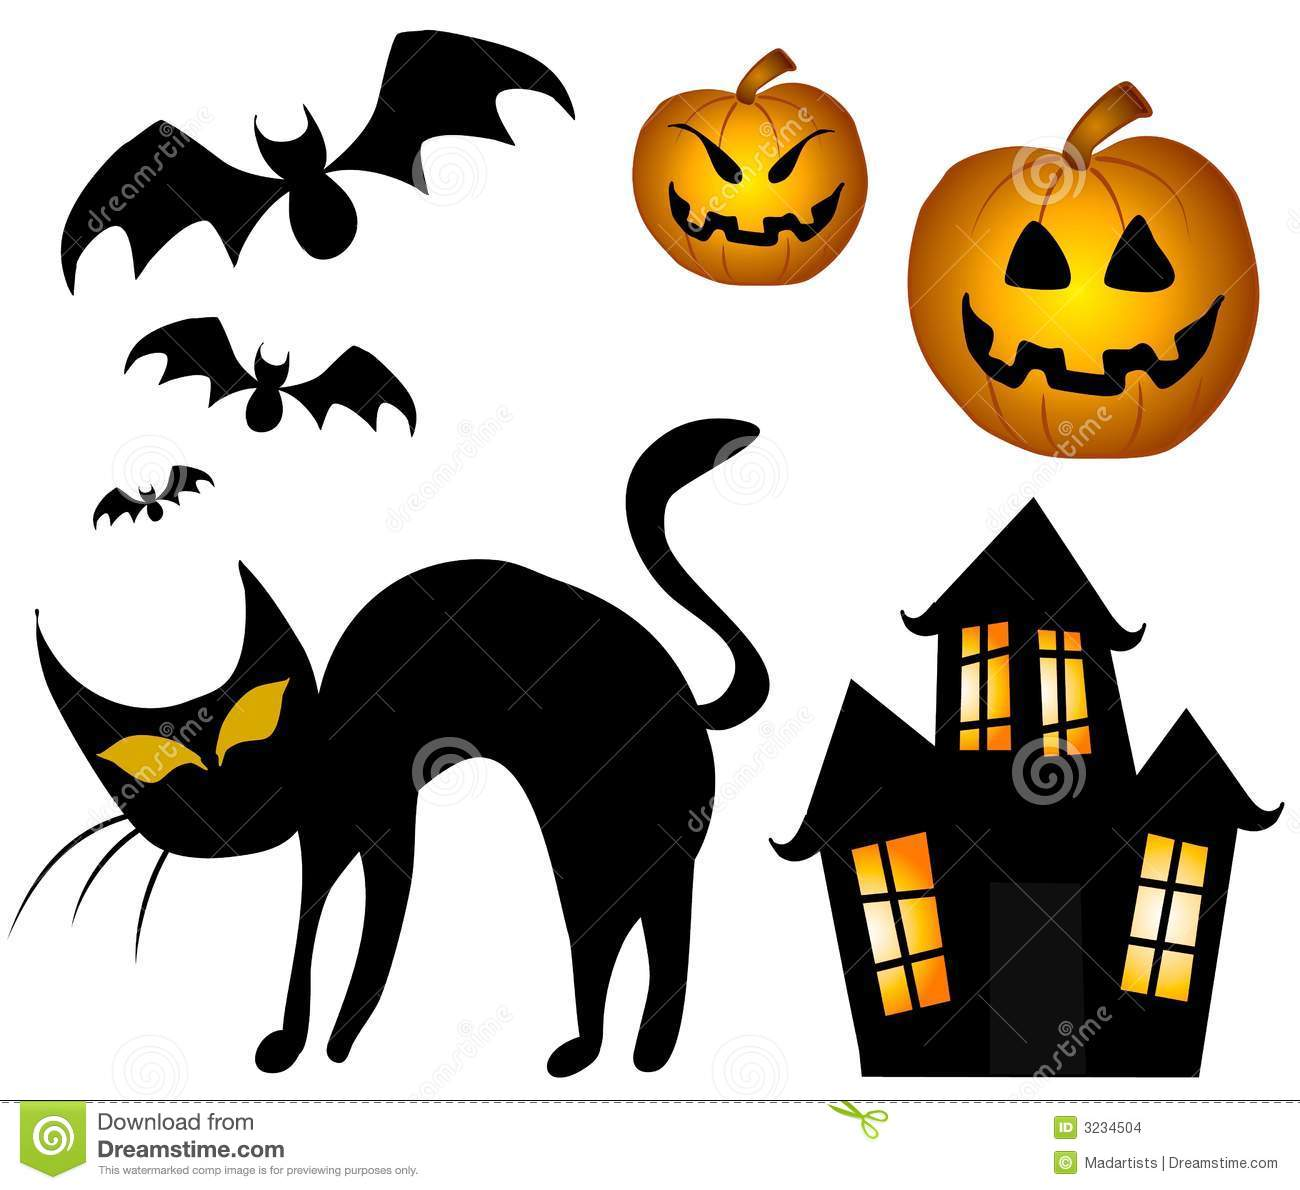 Halloween printable clipart jpg black and white download Halloween Clip Art Free Printable | Clipart Panda - Free Clipart ... jpg black and white download